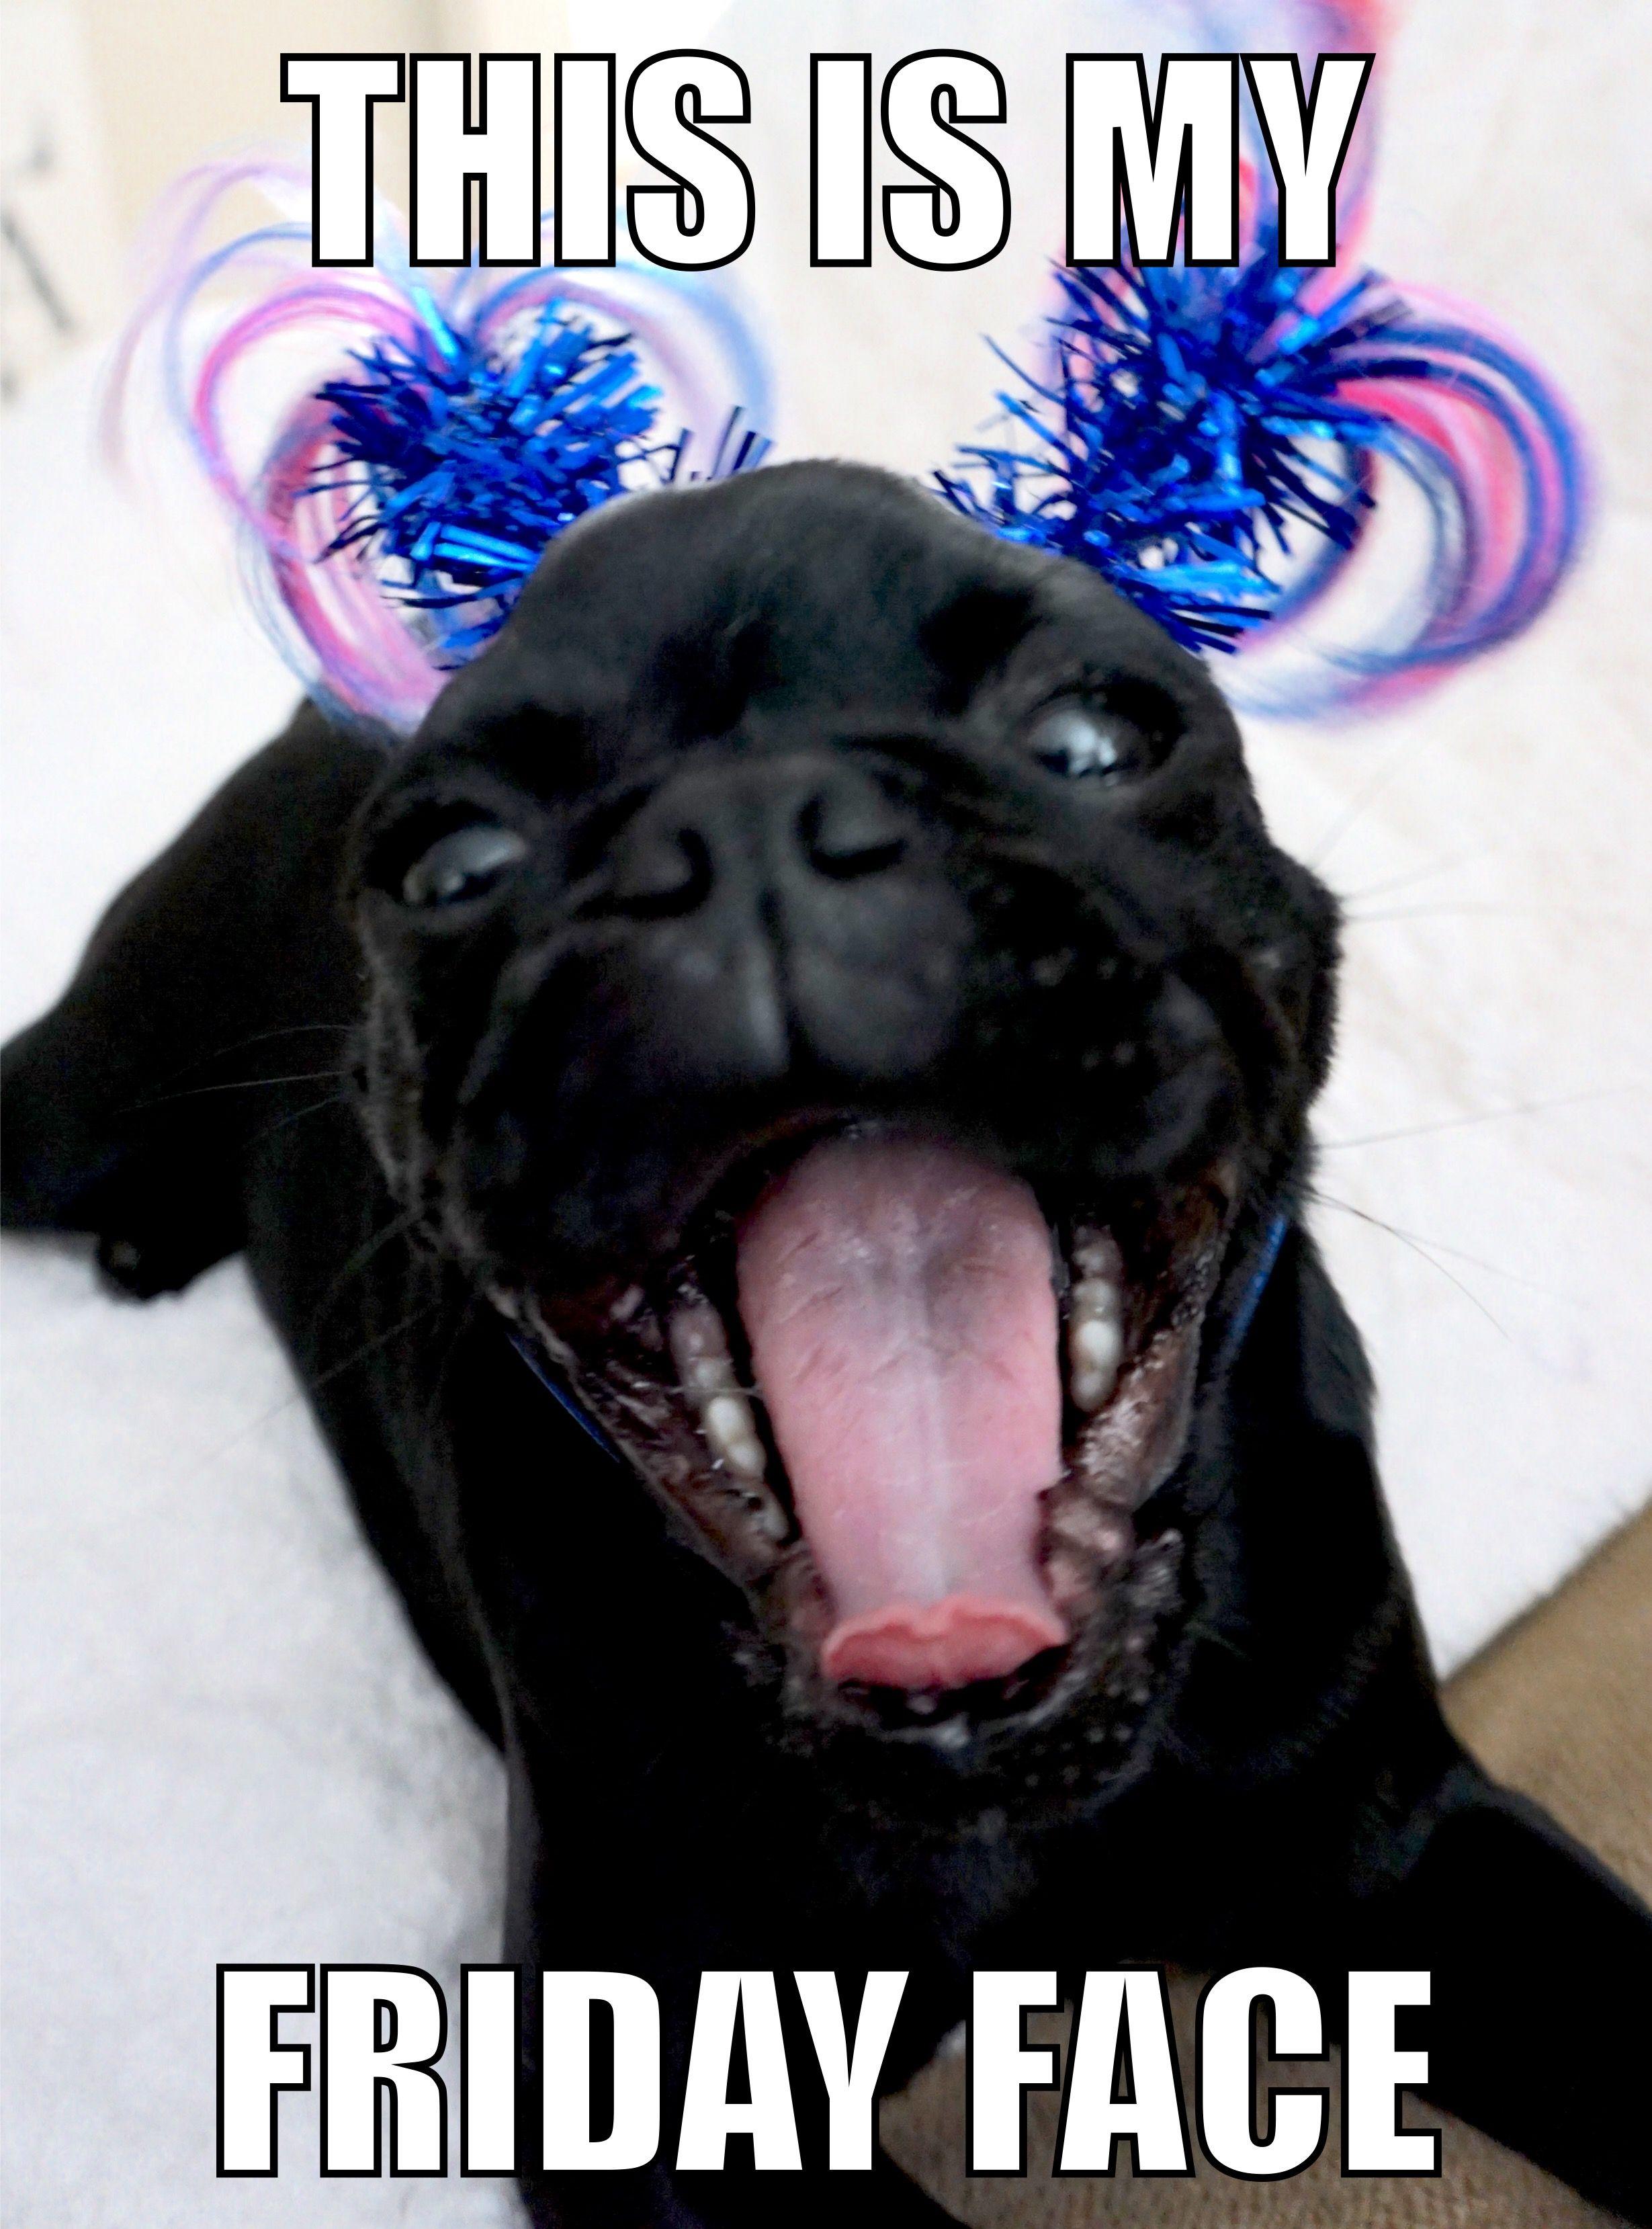 friday friday vibes funny pug funny meme pug meme friday